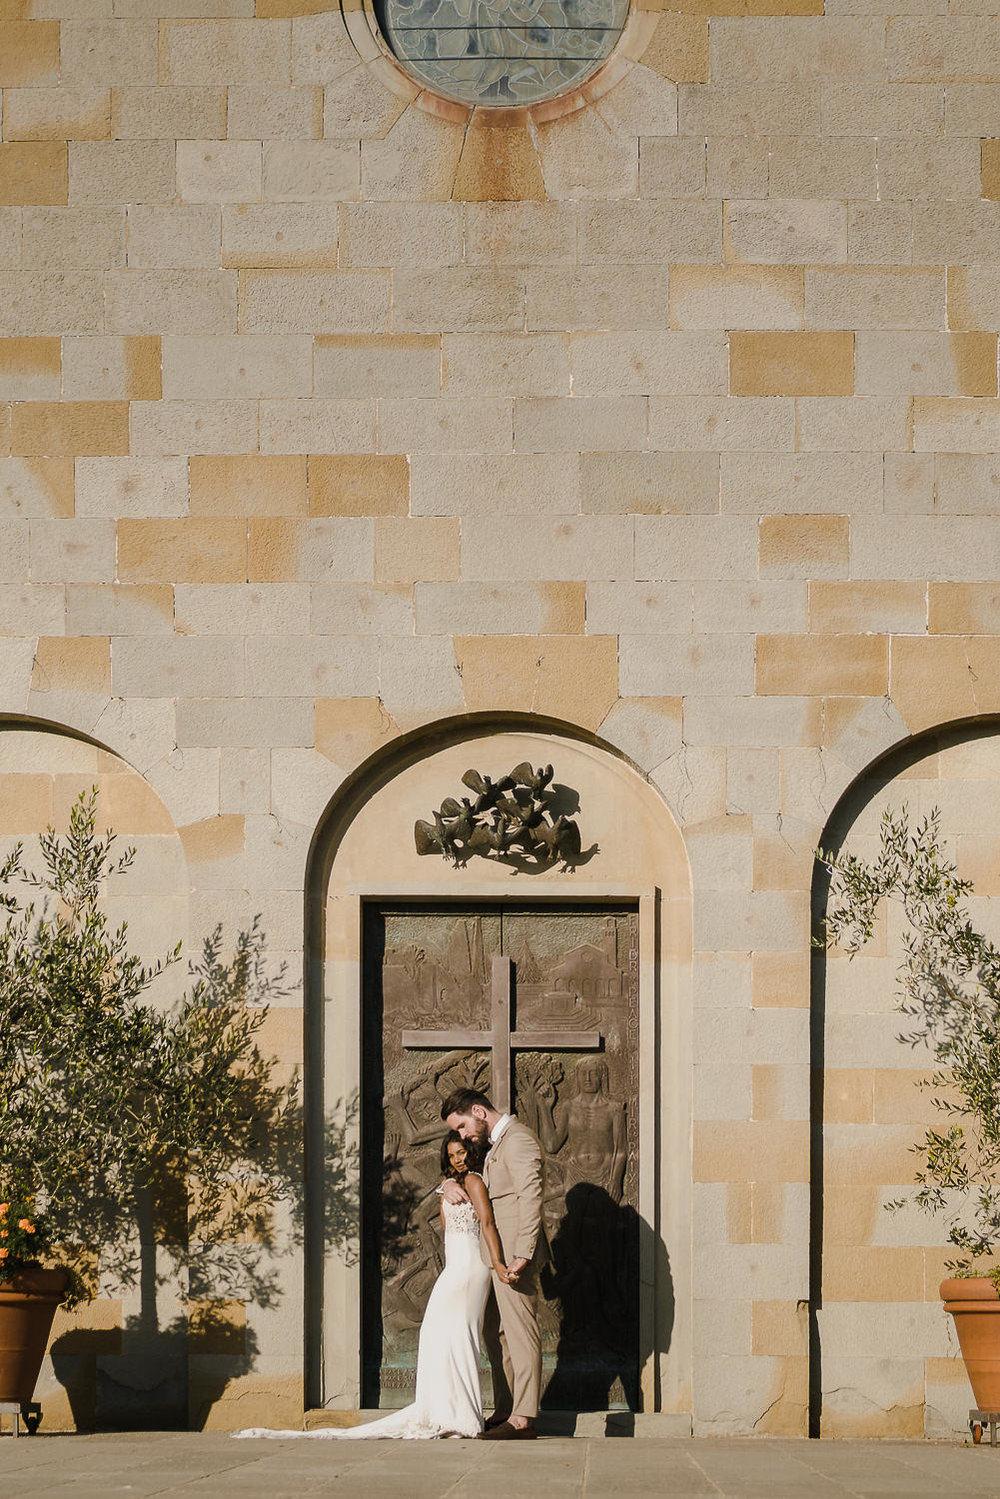 beste bruiloft fotograaf amsterdam, mark hadden, bruidspaar portret